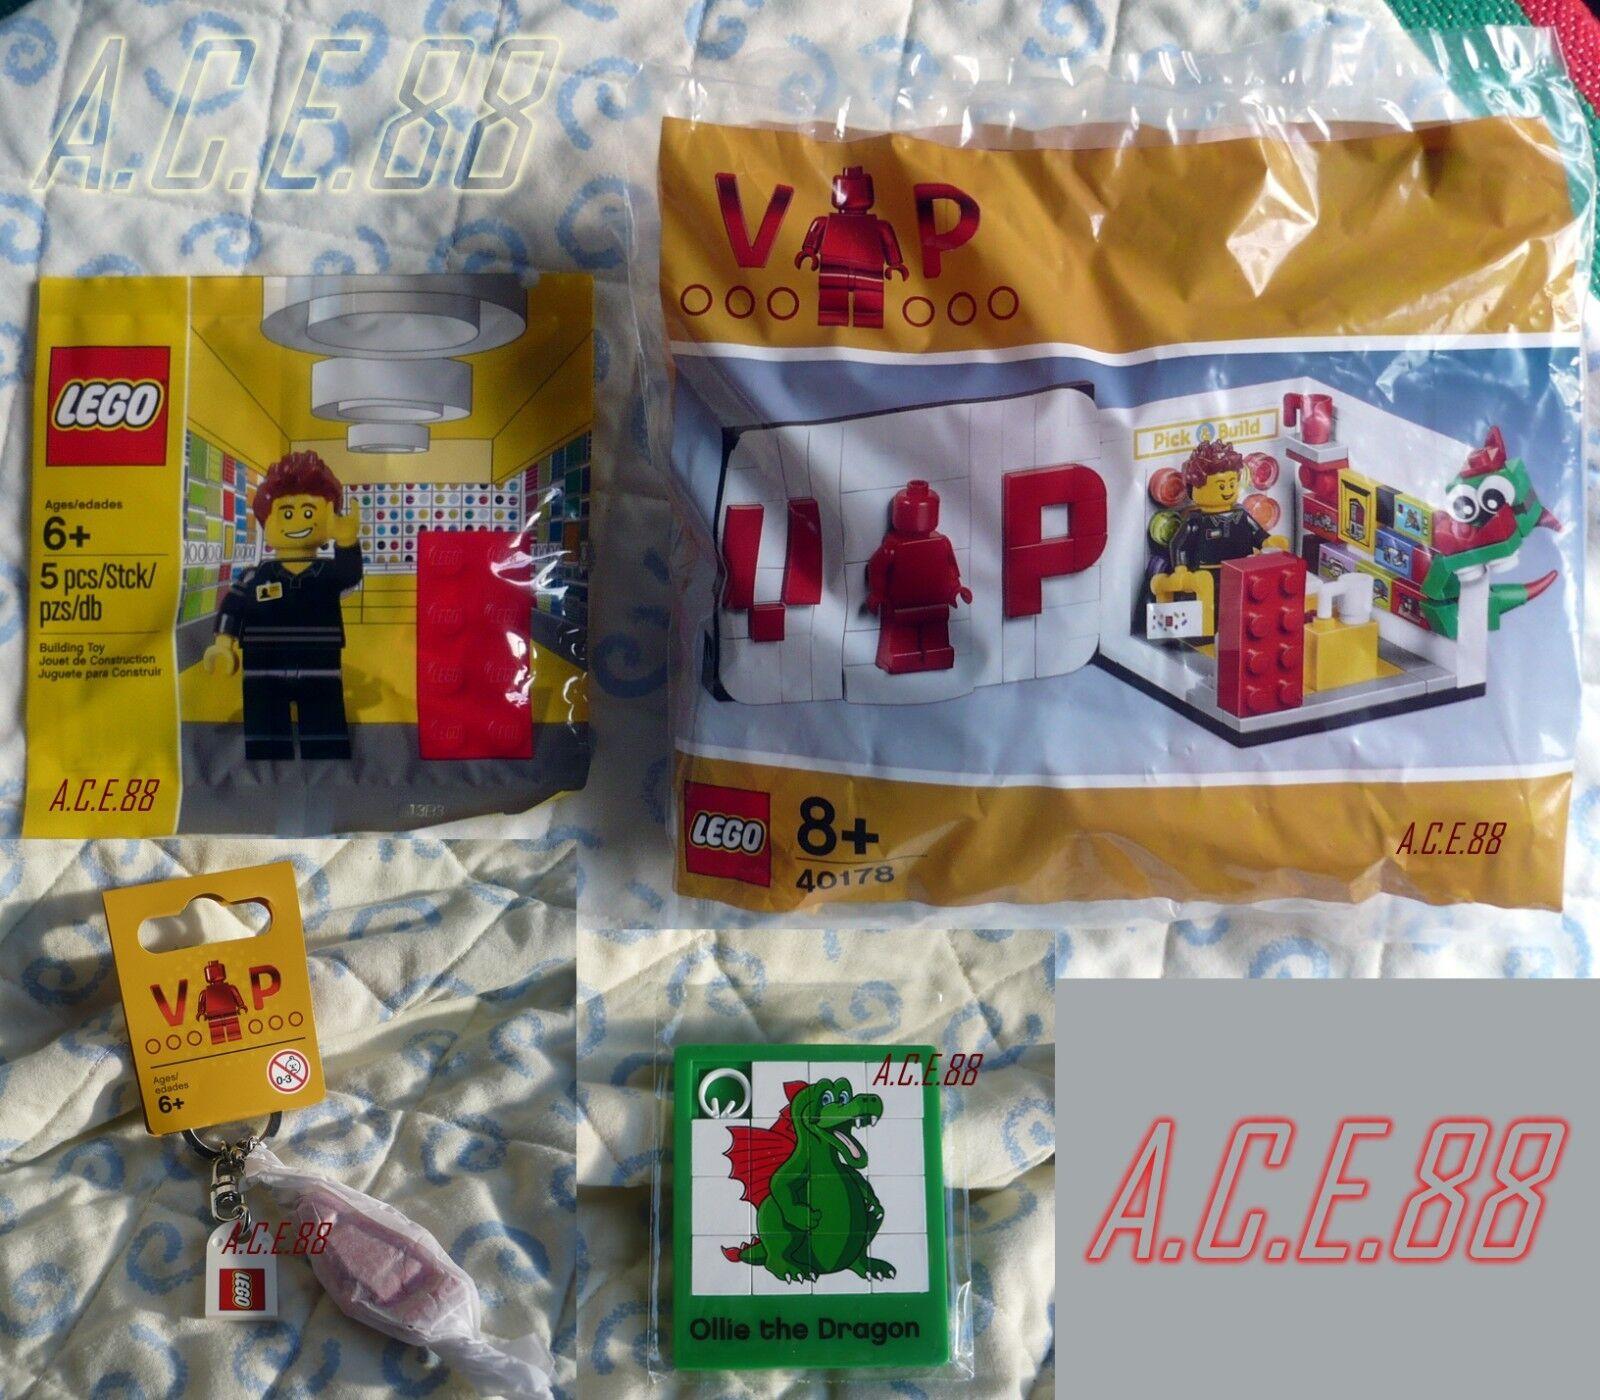 Lego 40178 5001622 Exclusive VIP Set Mini Lego Store Employee + Keychain + Ollie